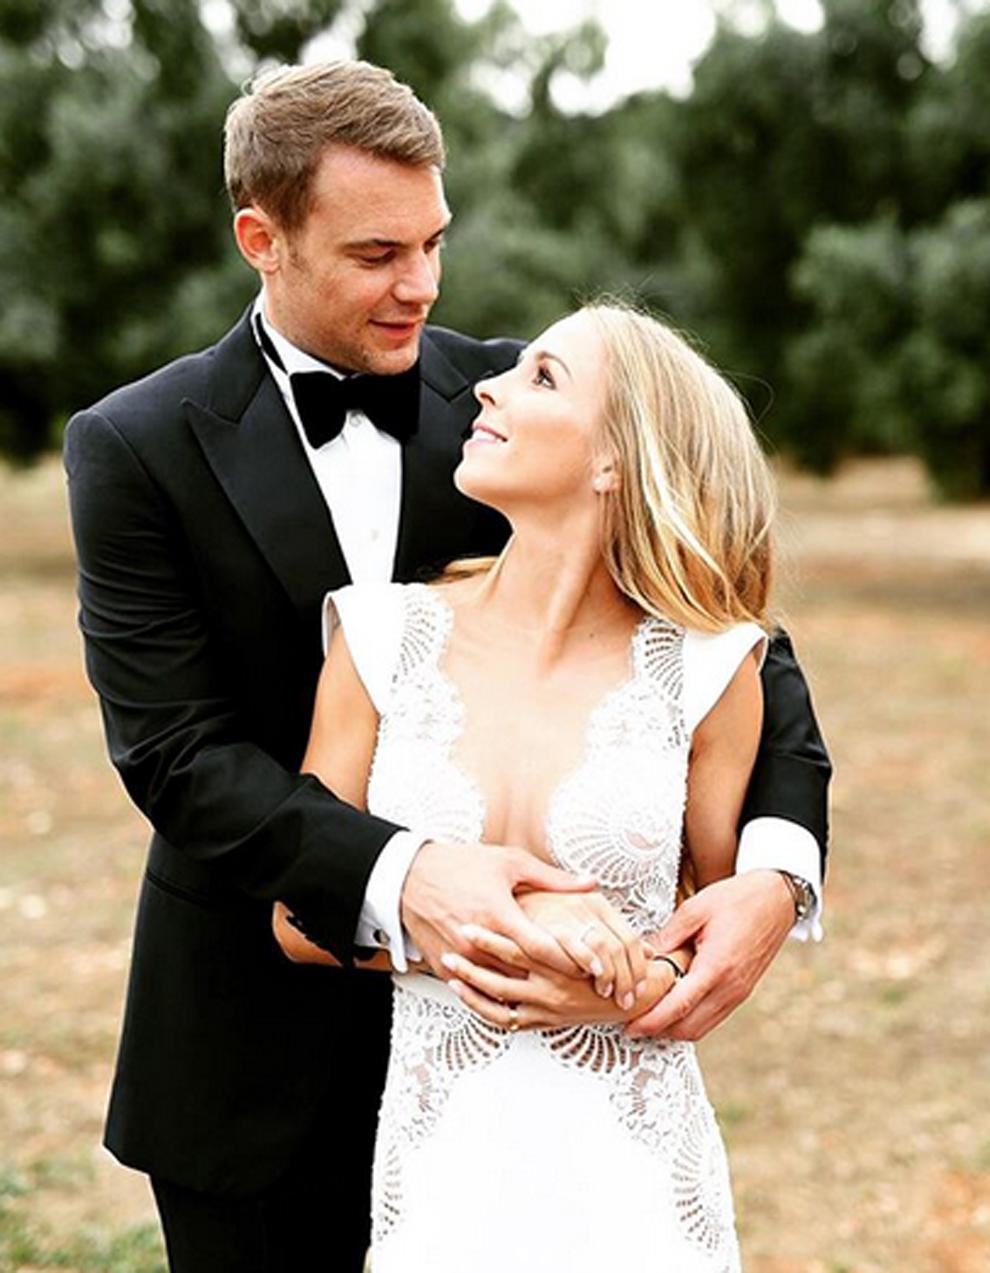 Manuel neuer with ex-wife nina weiss | MARCA English